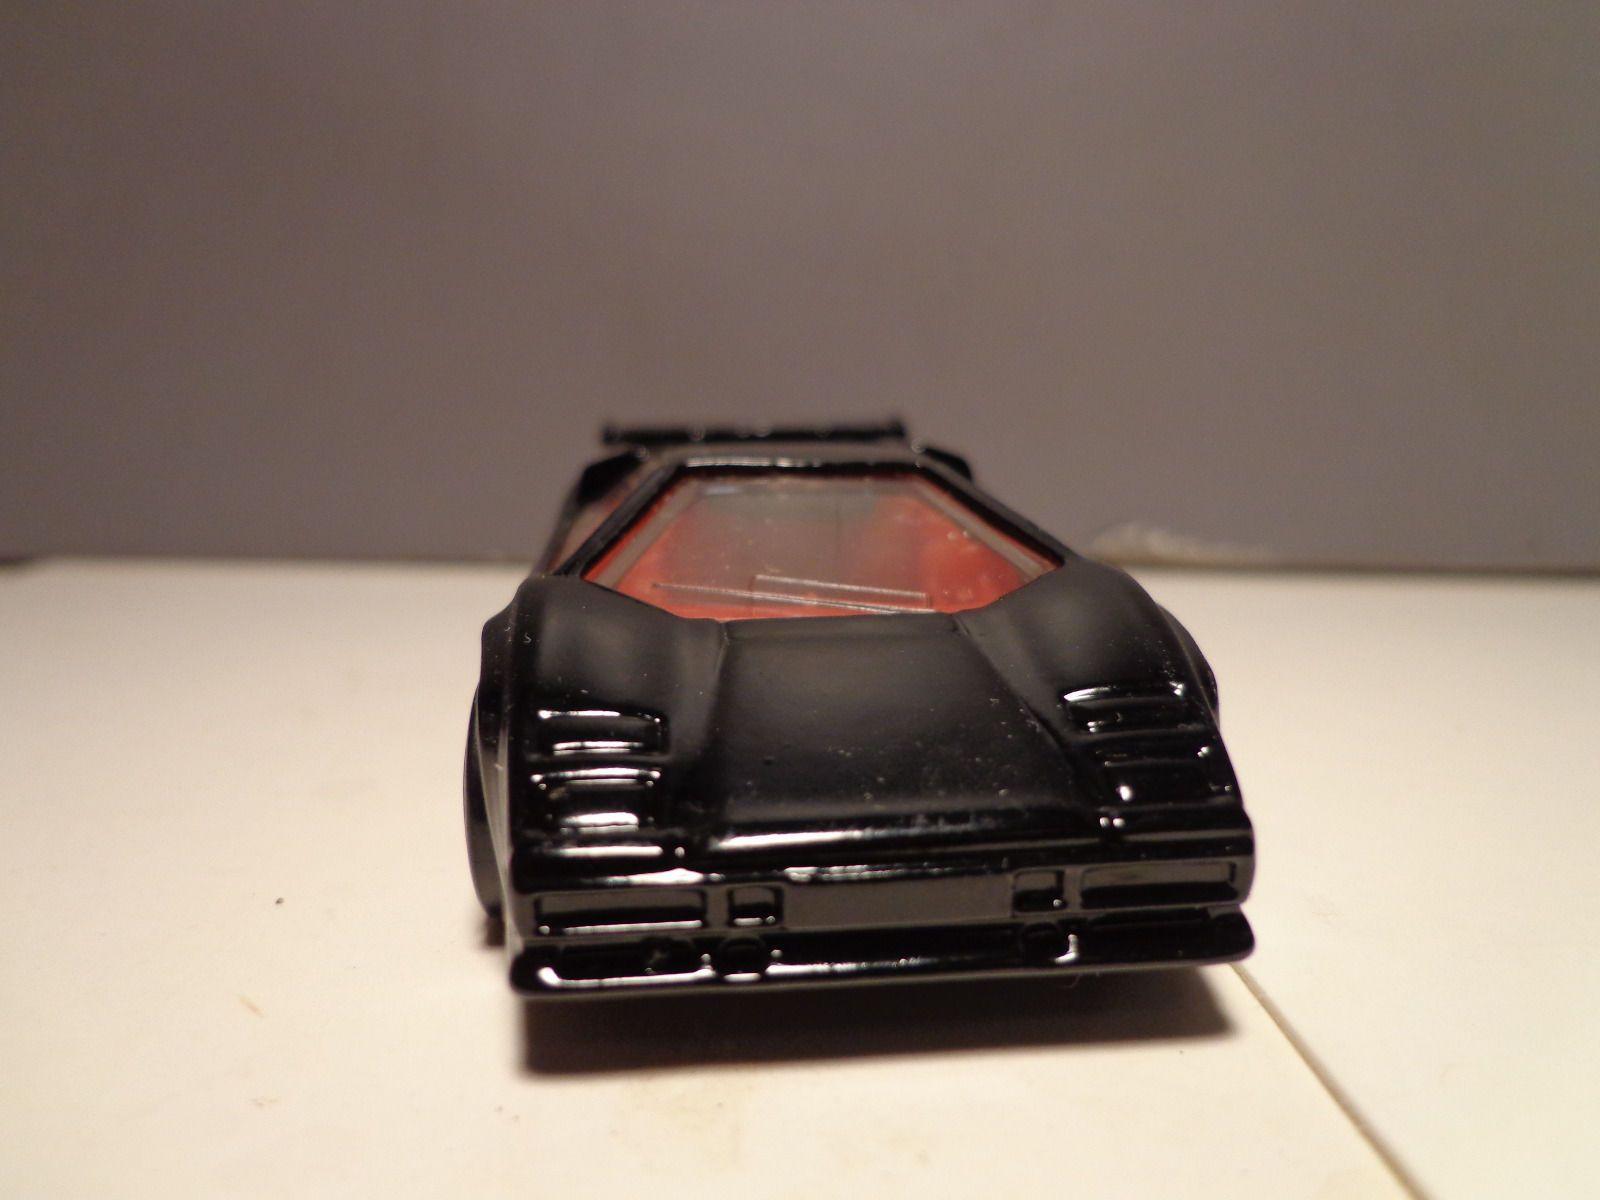 81b5decc06d09e330d3005c51dd67214 Astounding Lamborghini Countach Built In Basement Cars Trend